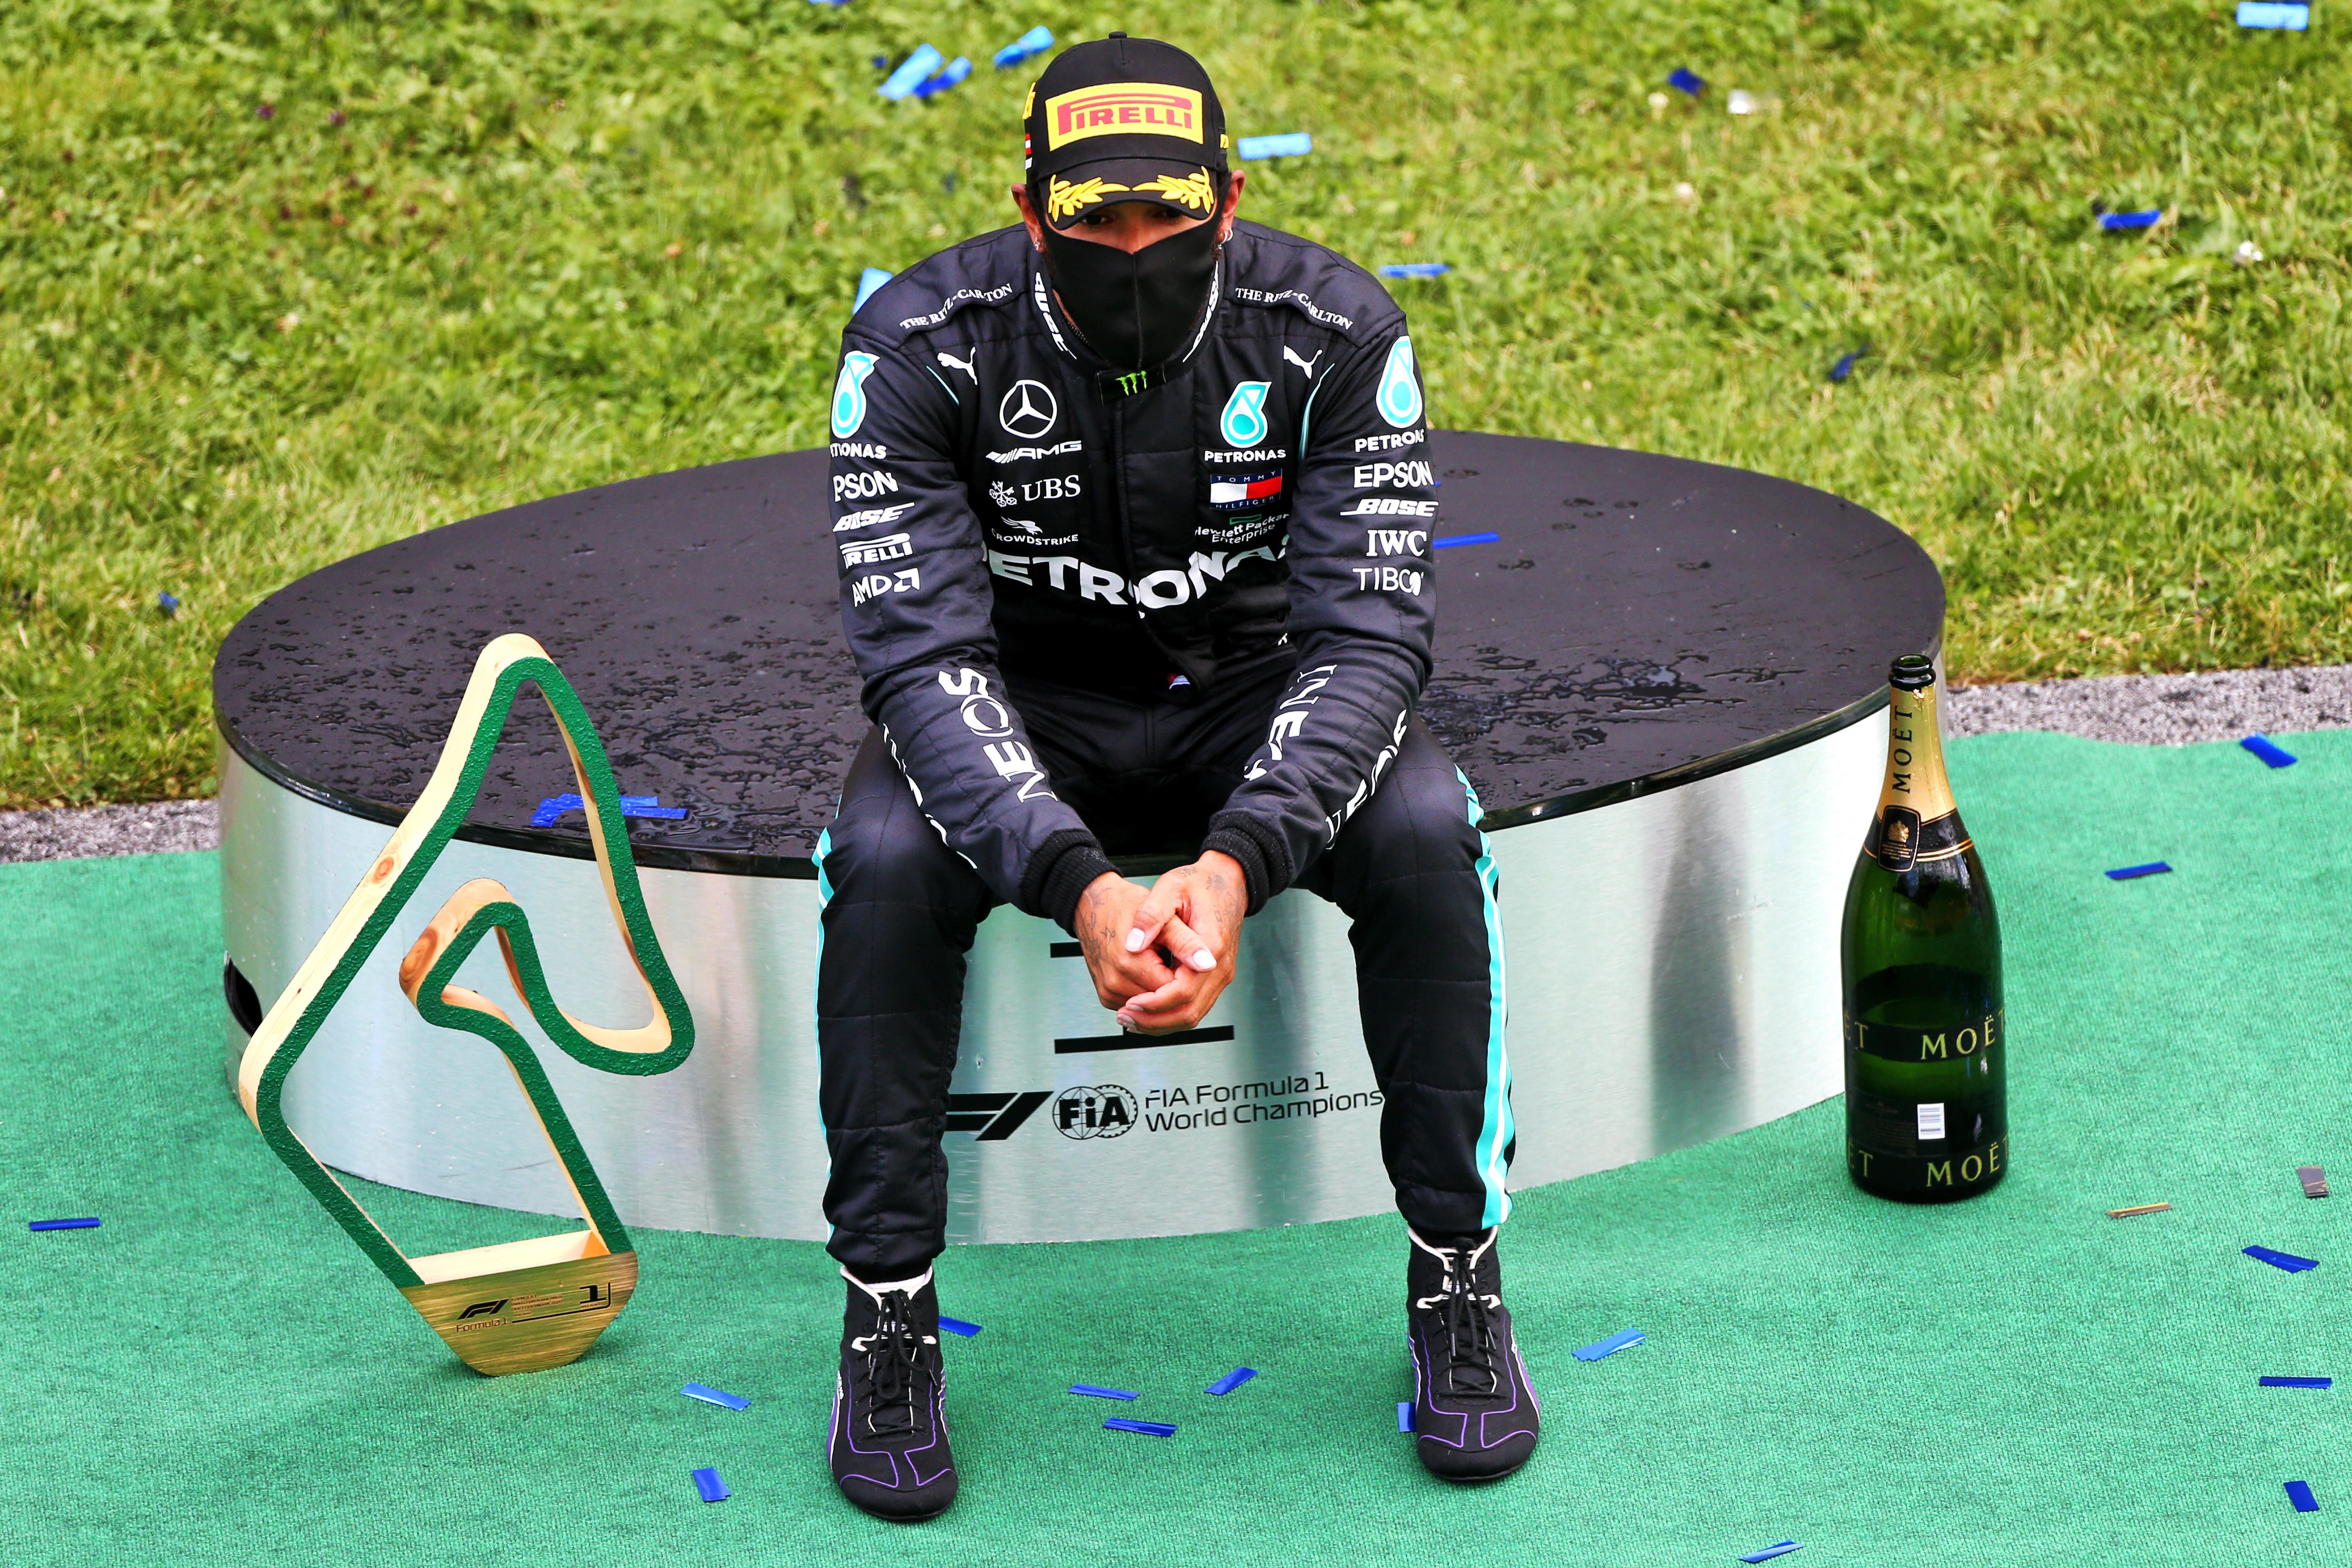 Motor Racing Formula One World Championship Steiermark Grand Prix Race Day Spielberg, Austria